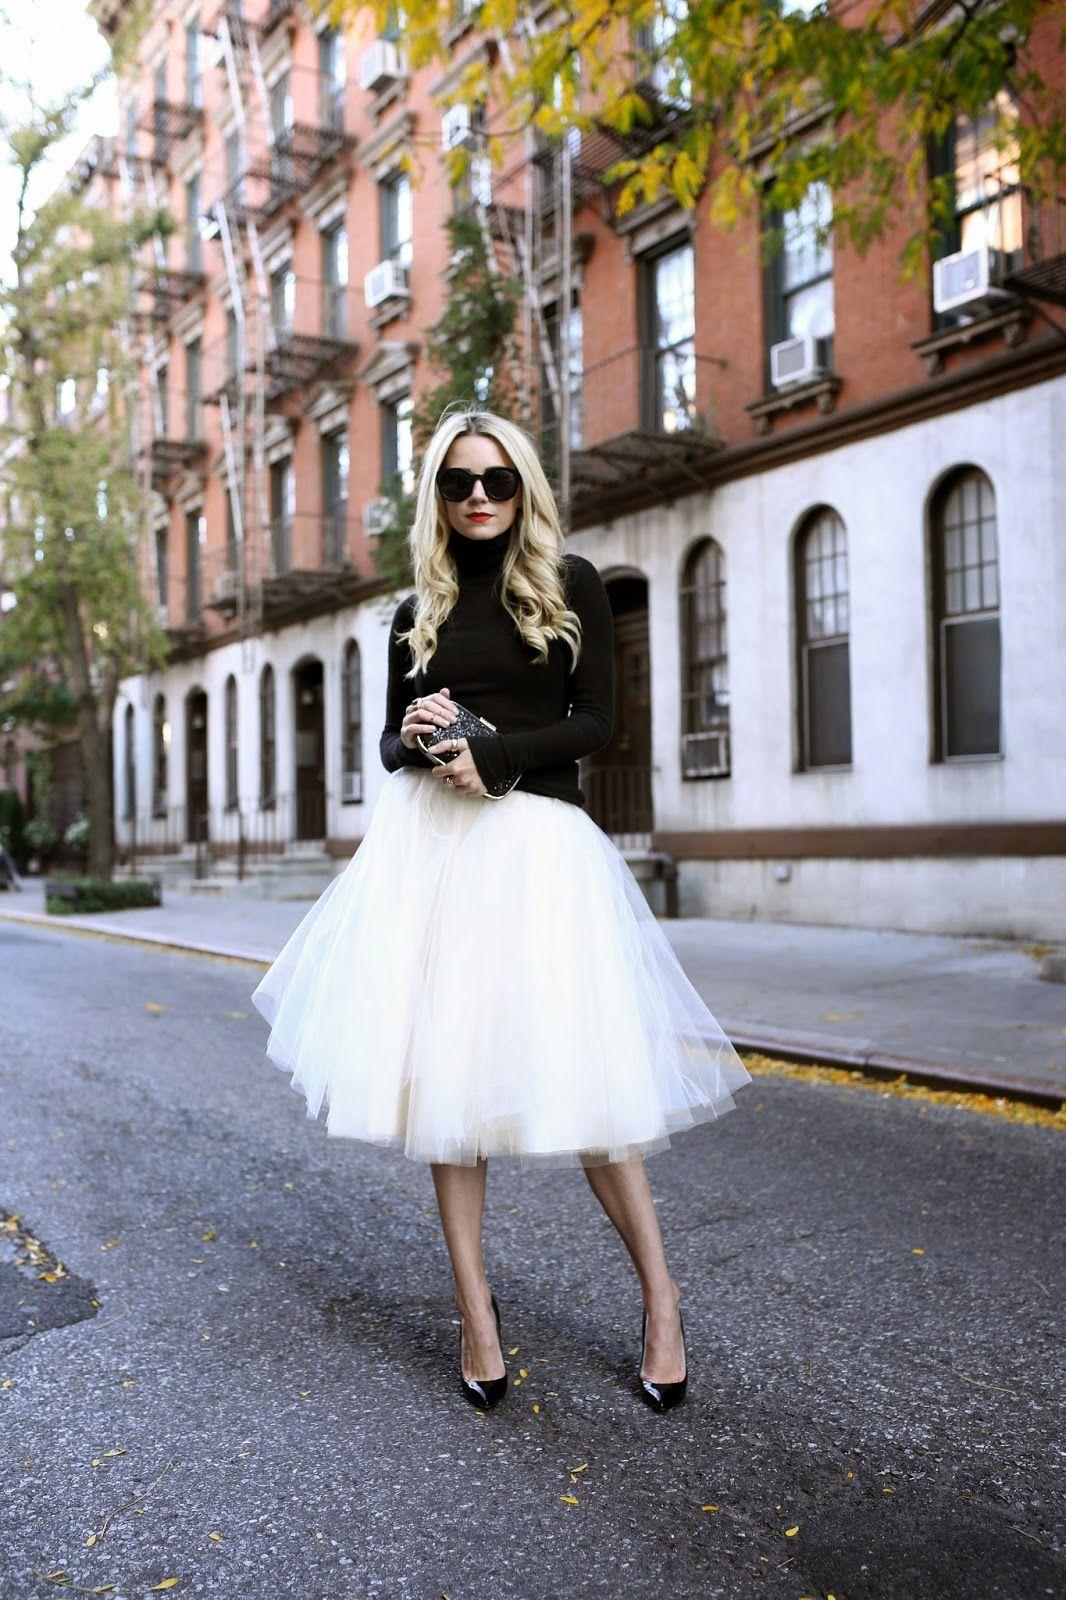 Atlantic Pacific Fashion White Tulle Skirt Tulle Midi Skirt [ 1600 x 1066 Pixel ]